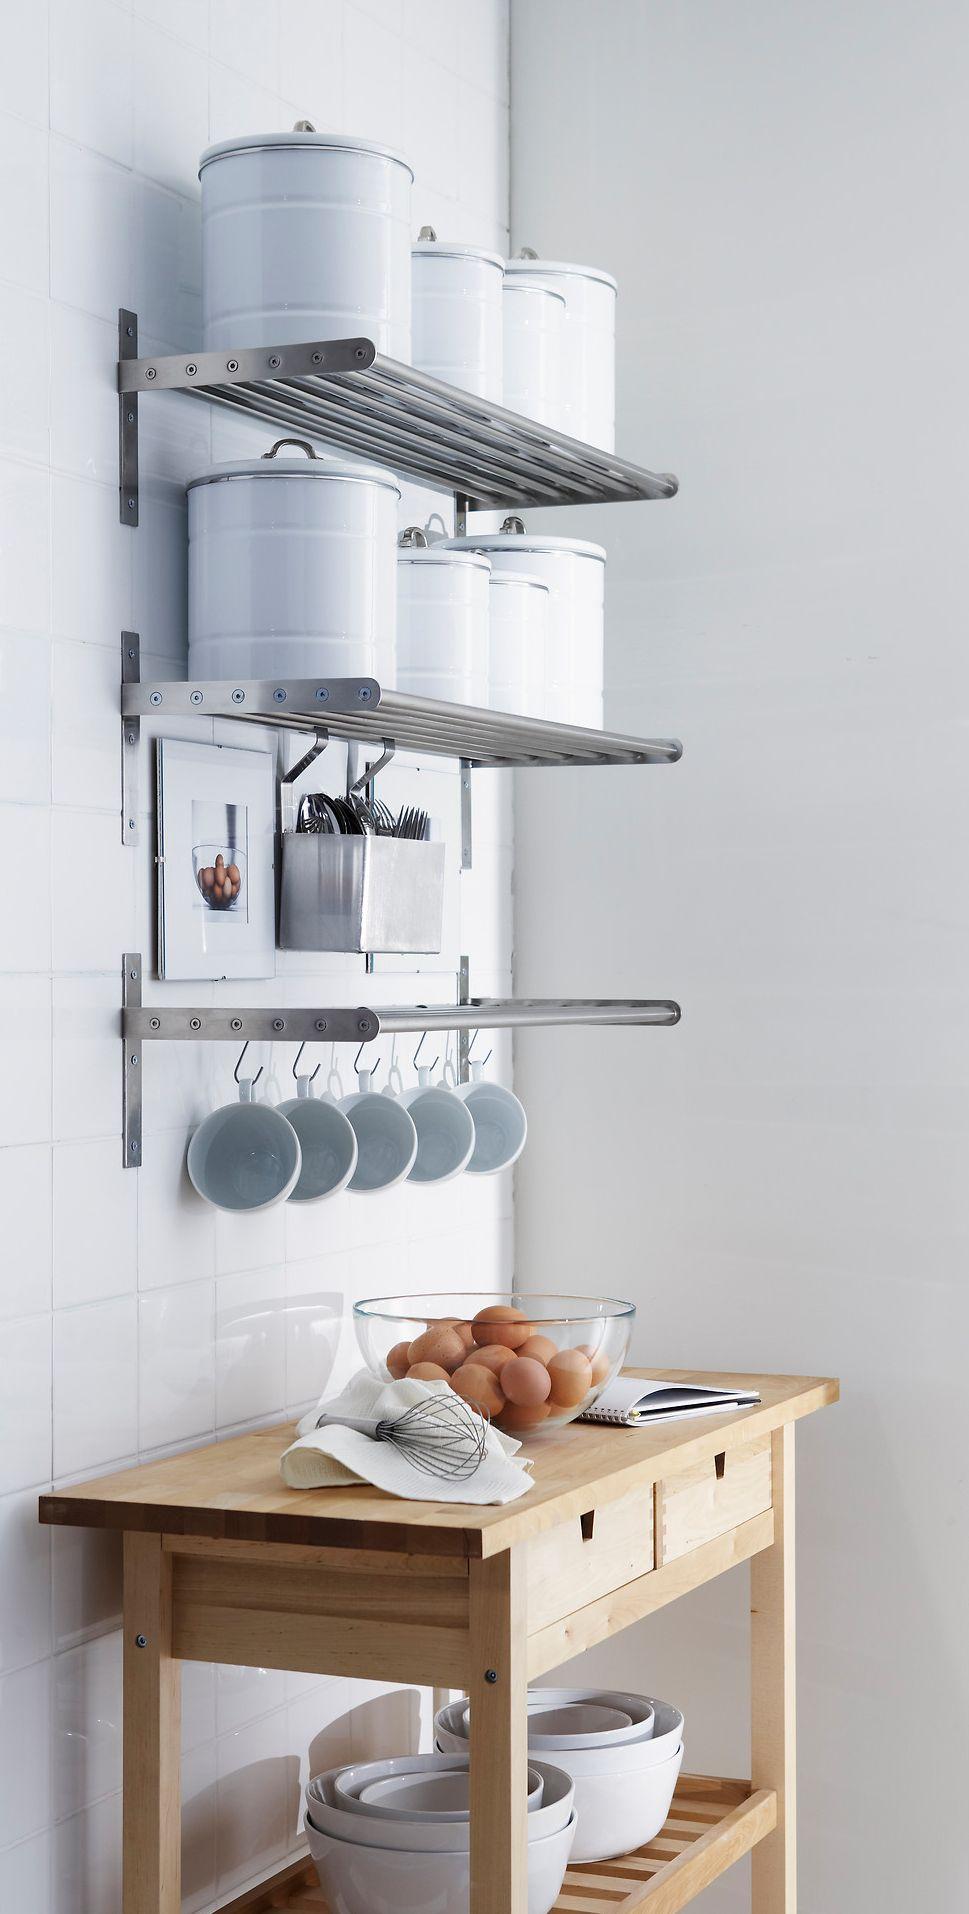 ingenious kitchen organization tips and storage ideas ikea grundtal wall organizer floating shelves for white shelf metal shelving unit nailless ture hangers black mantel espresso